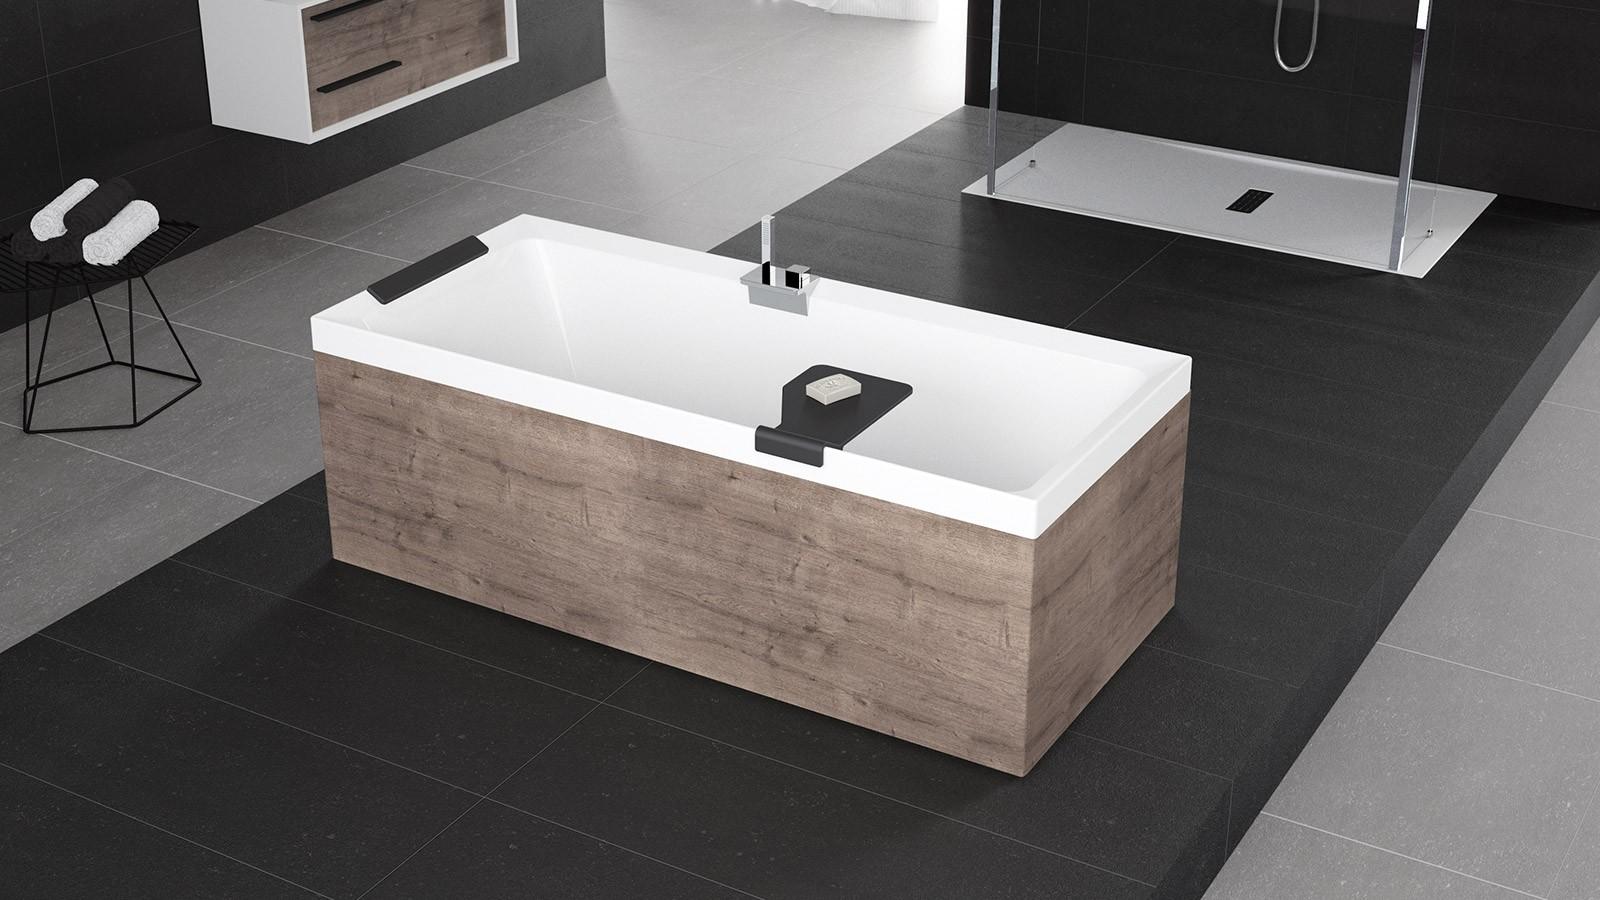 Top vasca da bagno piccola misure cheap vasca da bagno lunghezza with vasche da bagno basse - Vernice per vasca da bagno prezzi ...